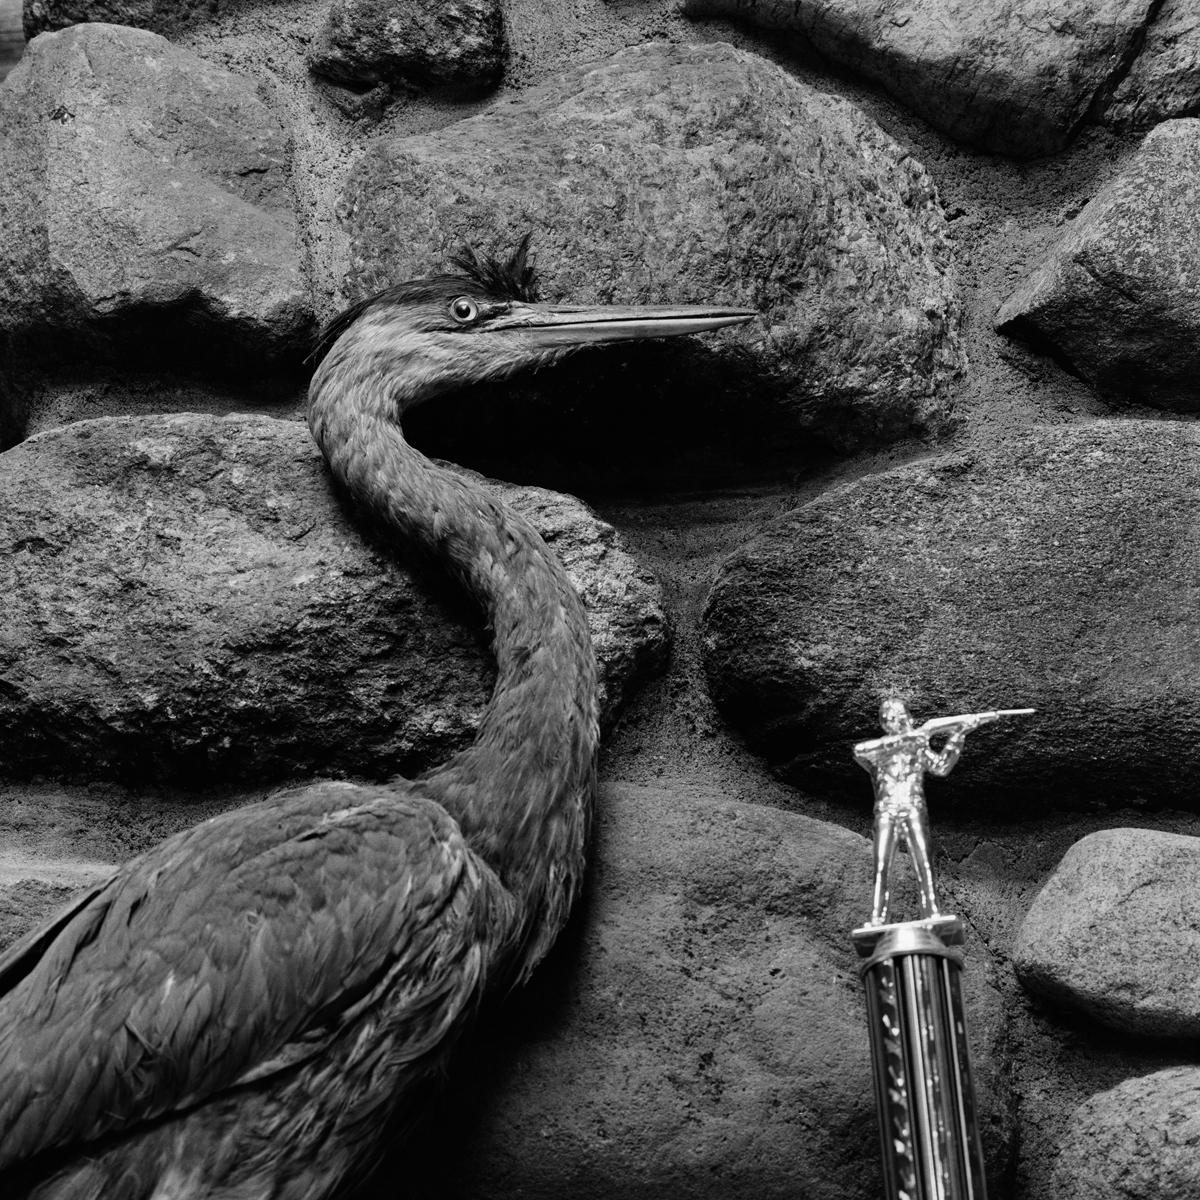 8. Blue Heron and Trophy, Rod and Game Club, Saranac Lake, NY. 2000. Toned Gelatin Silver Print.